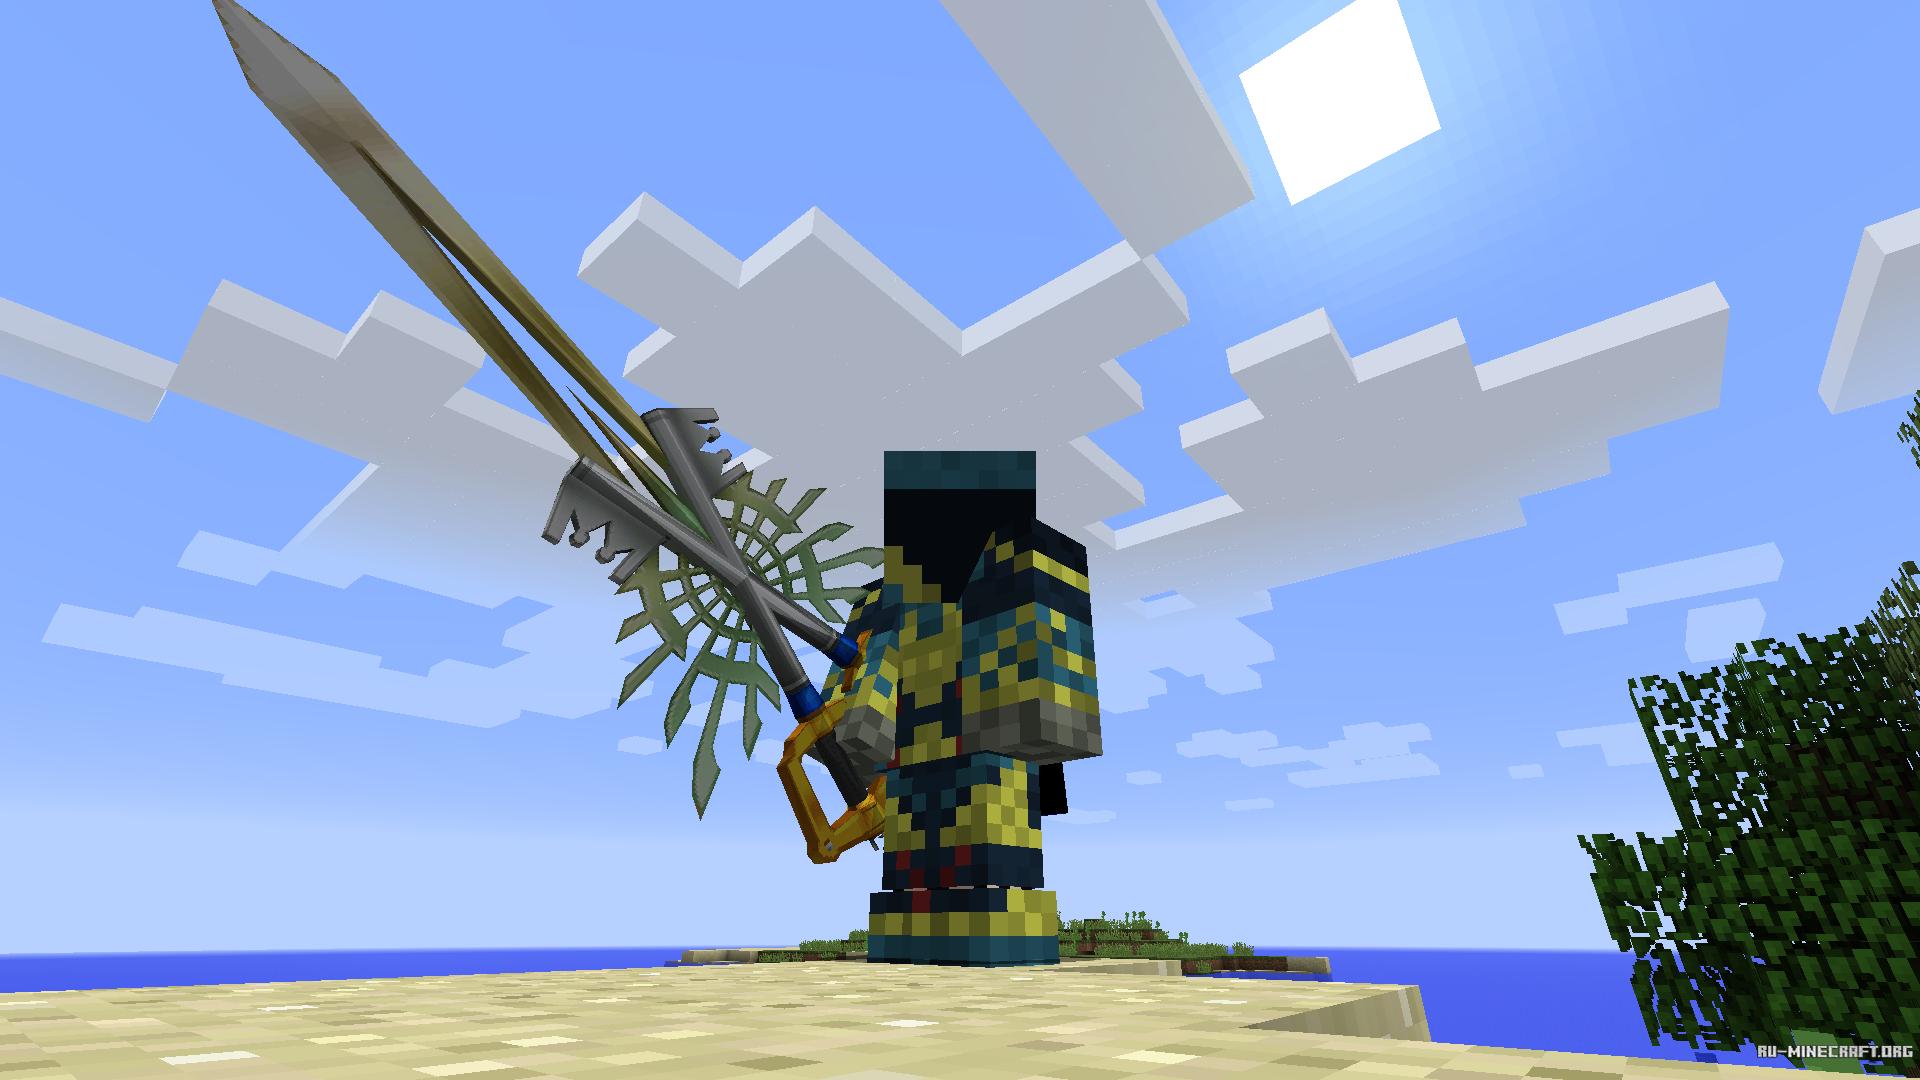 моды на оружию и броню богов майнкрафт 1.7.10 #8